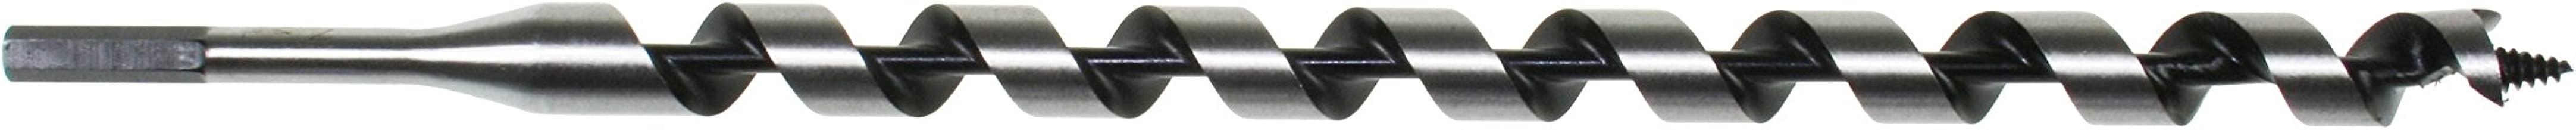 Fartools 175307 Tornillo para barreno 200 mm